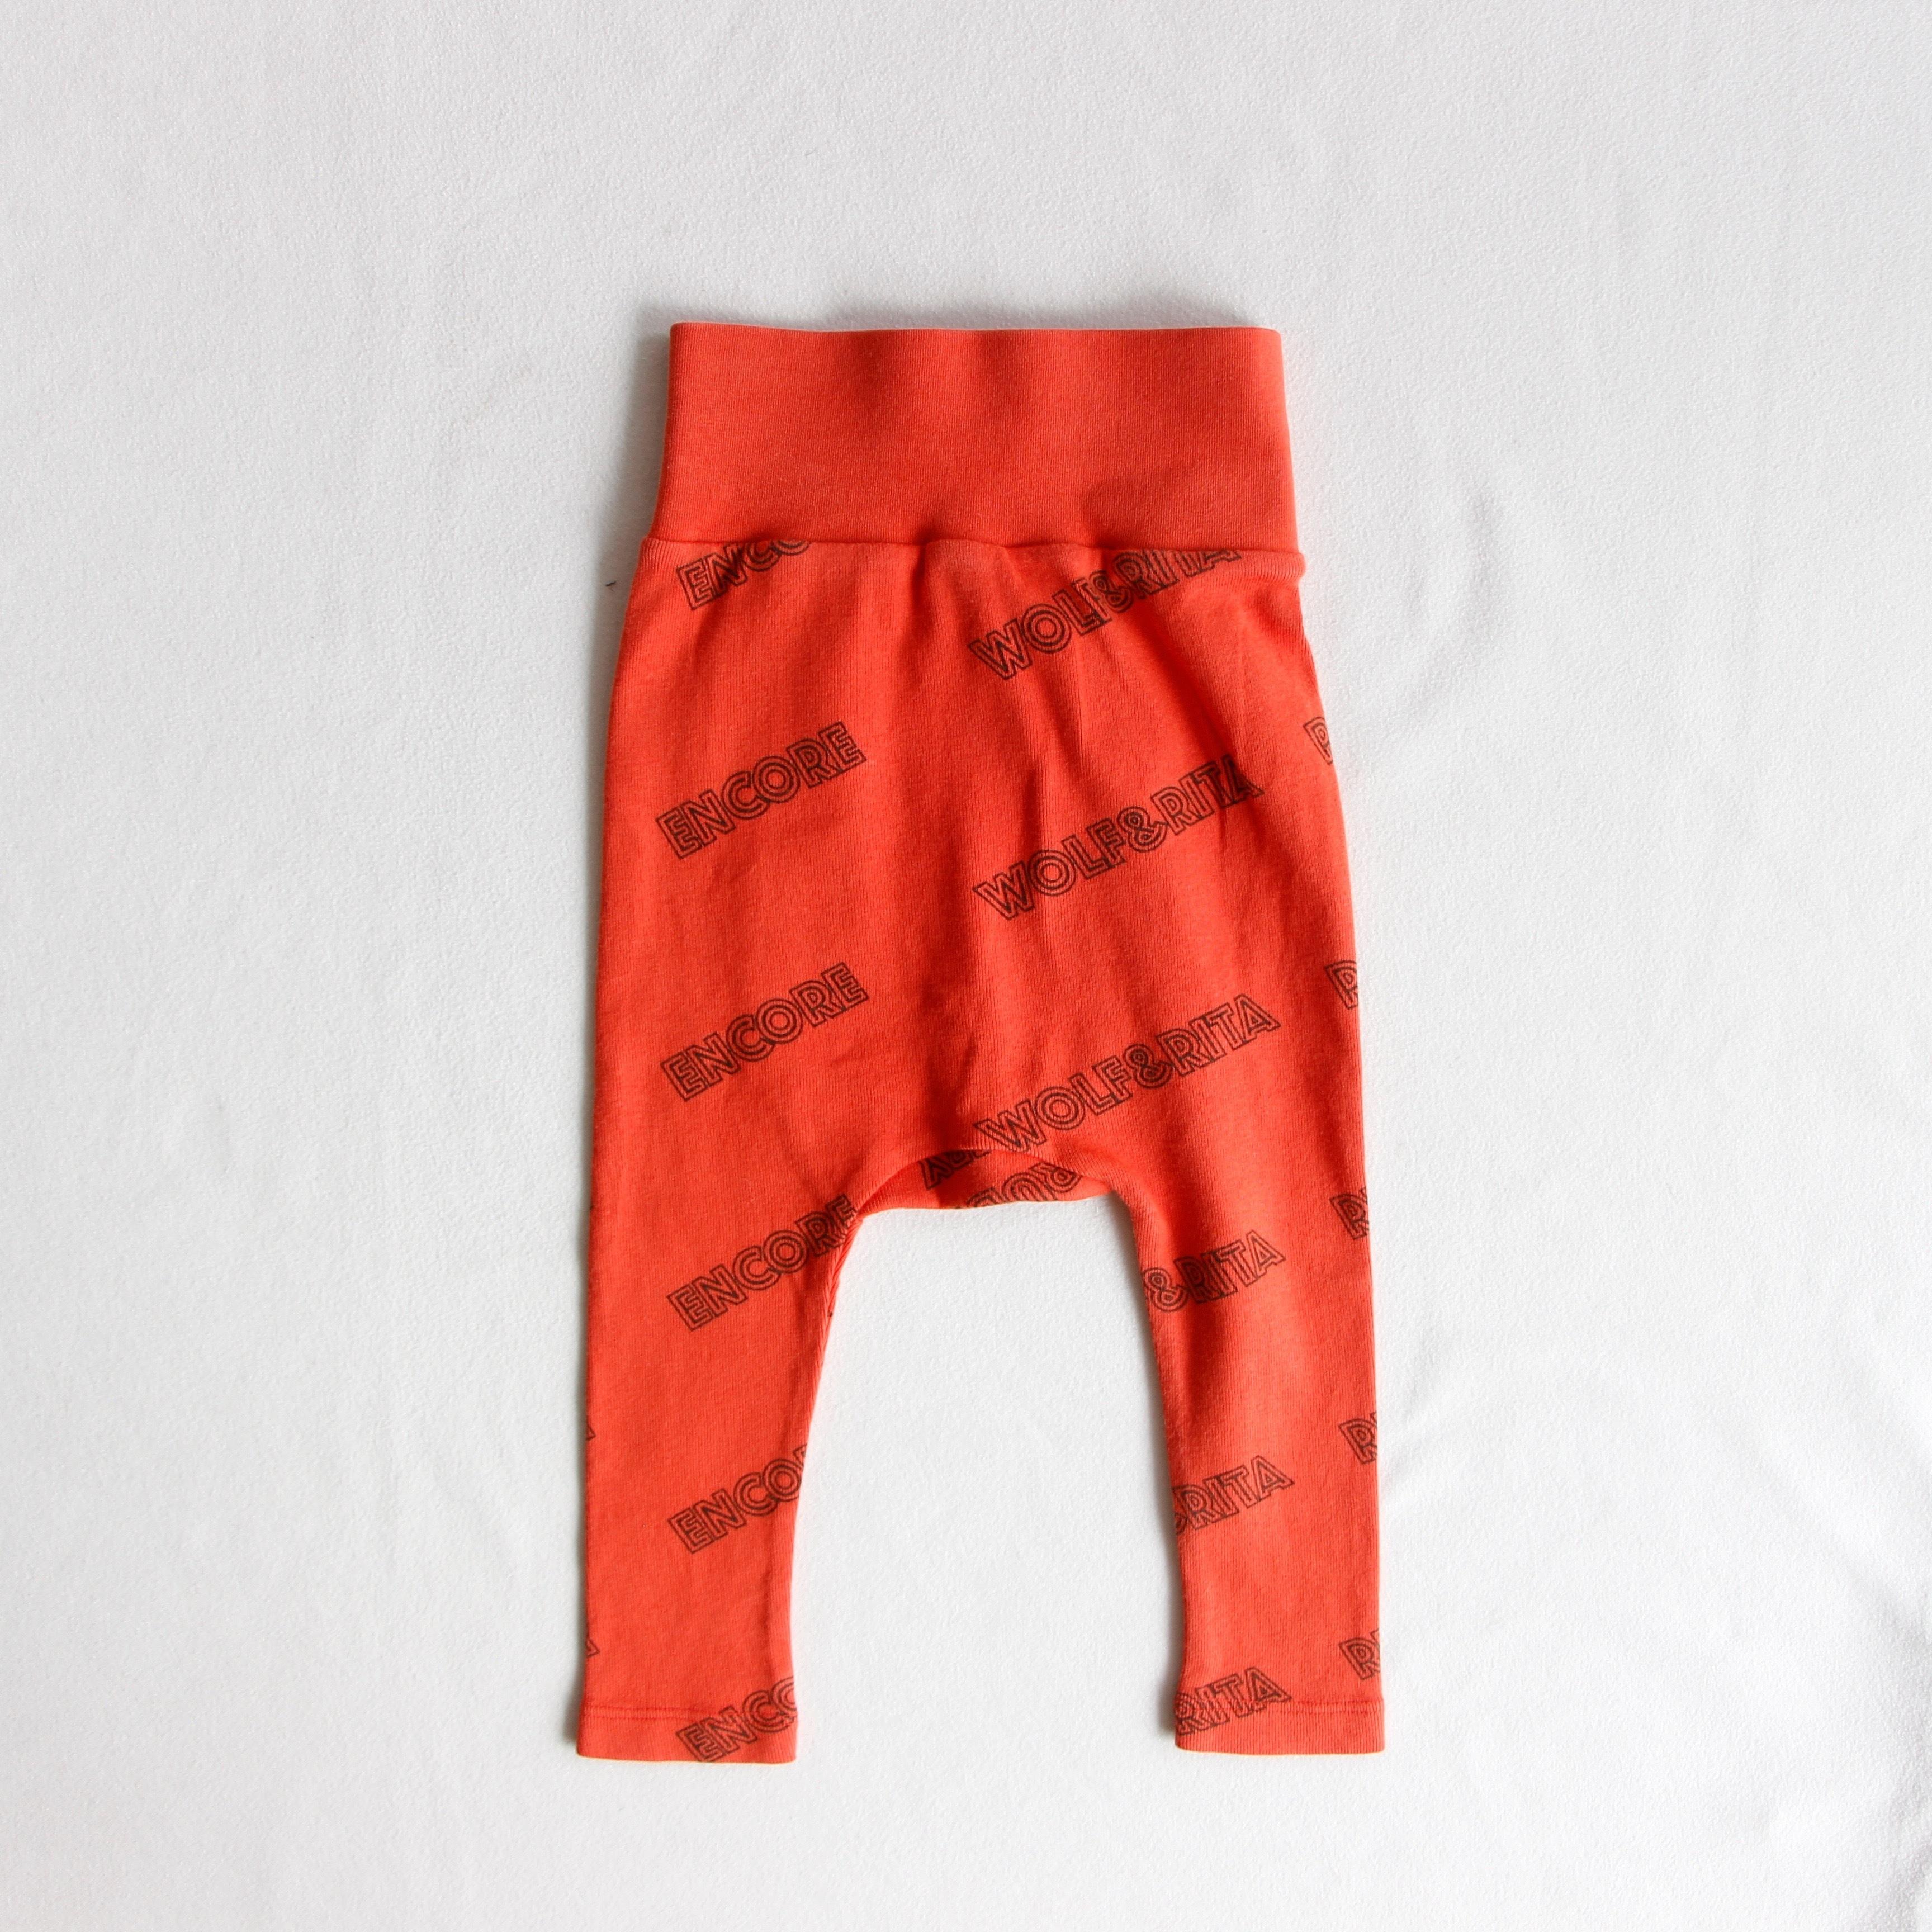 《WOLF & RITA 2020SS》JOAO Leggings / RUDY RUBY RED